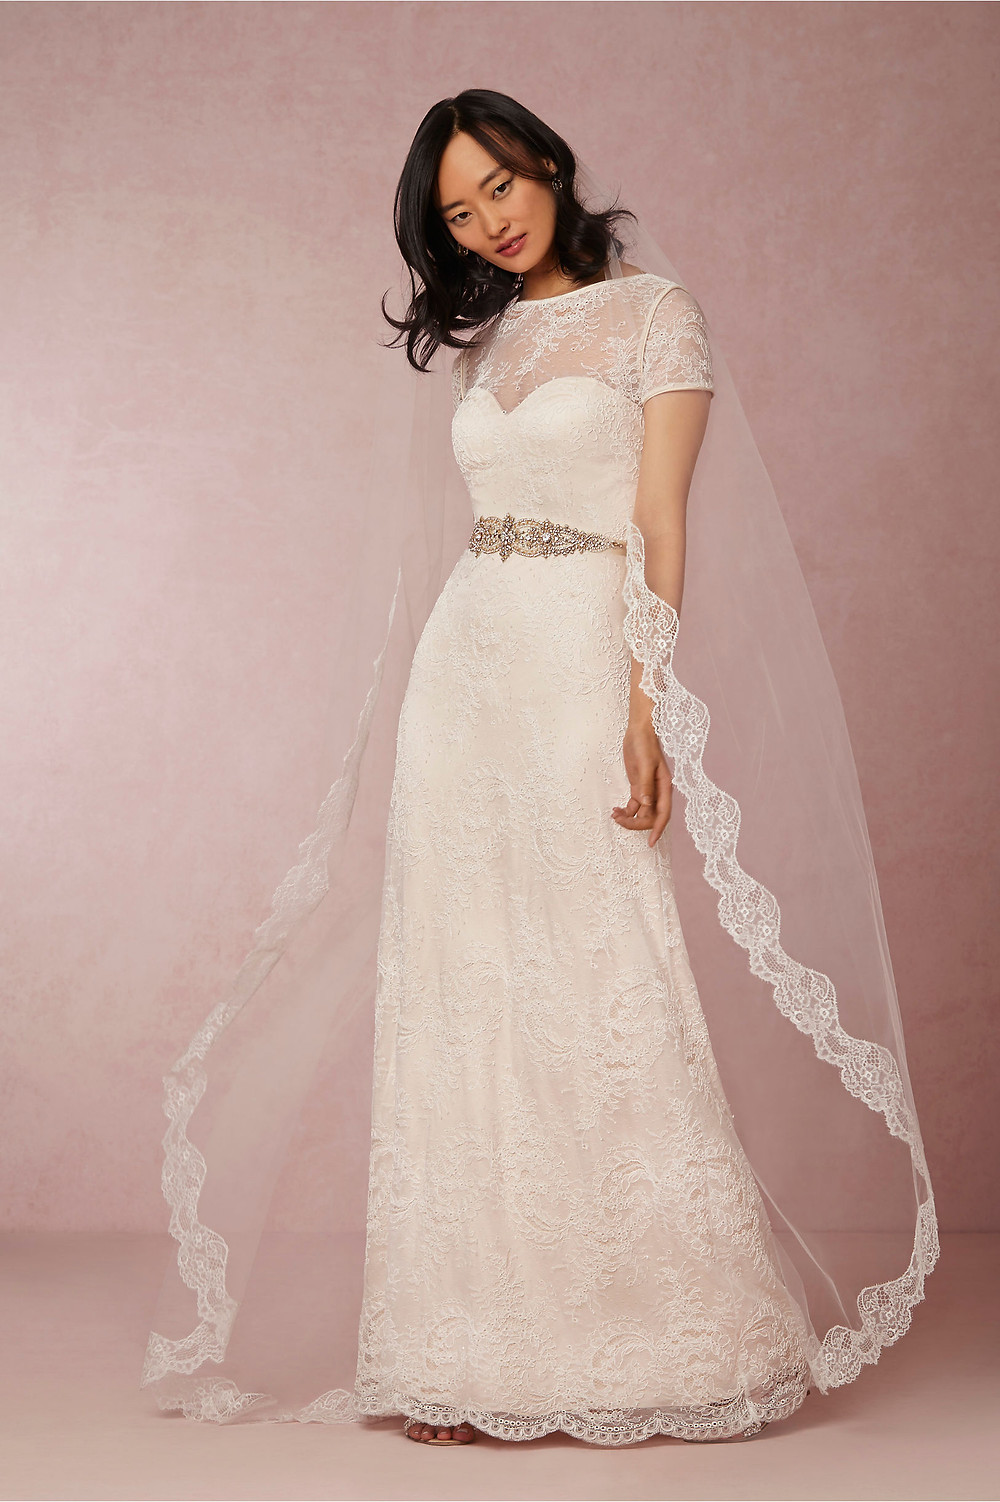 Bride wearing a chapel length veil